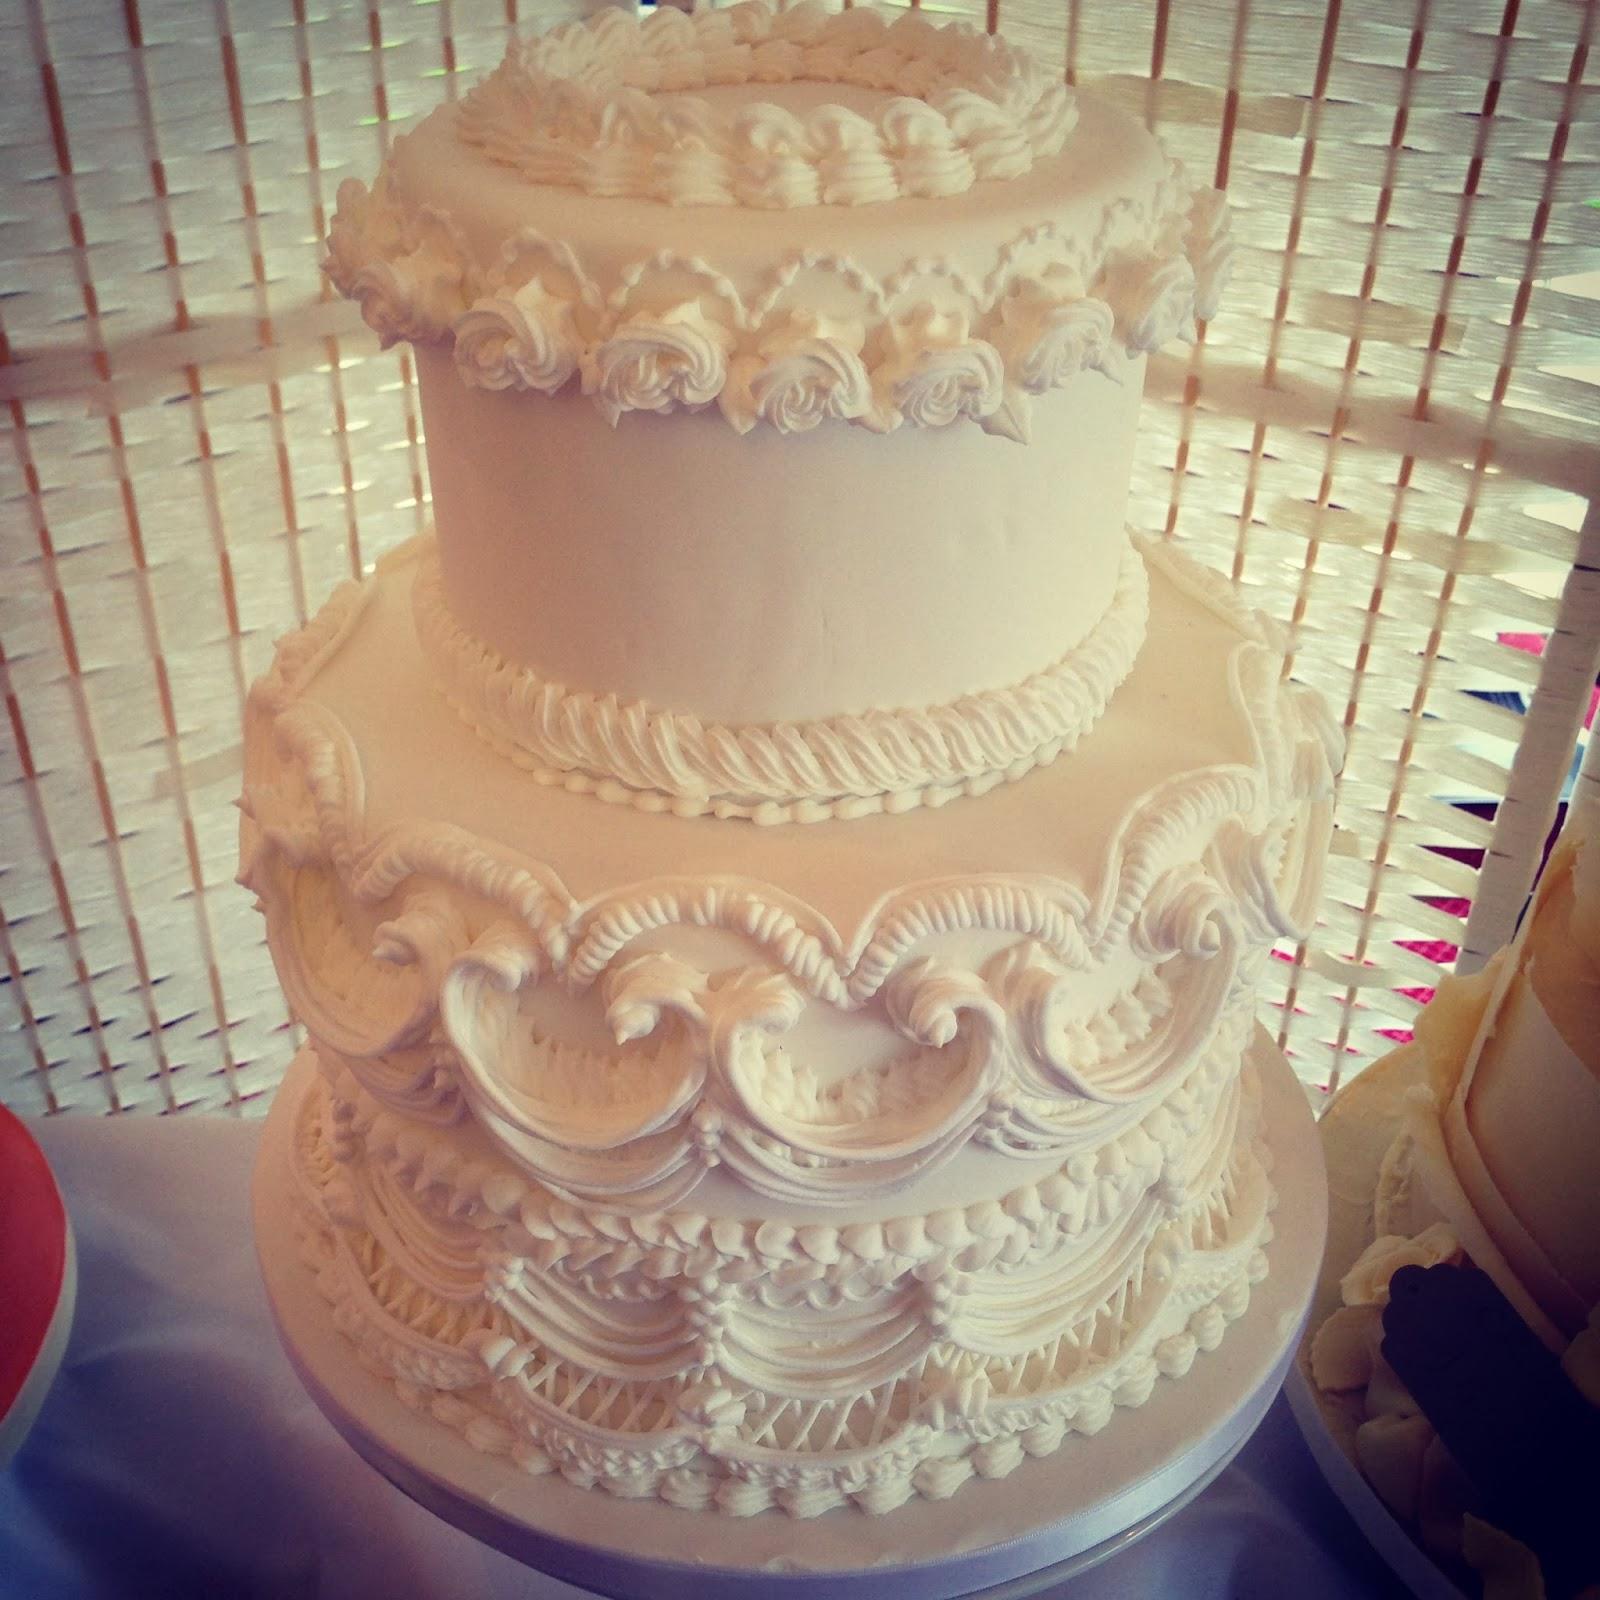 Cakesmiths Blog Lambeth wedding cake inspired by Prince